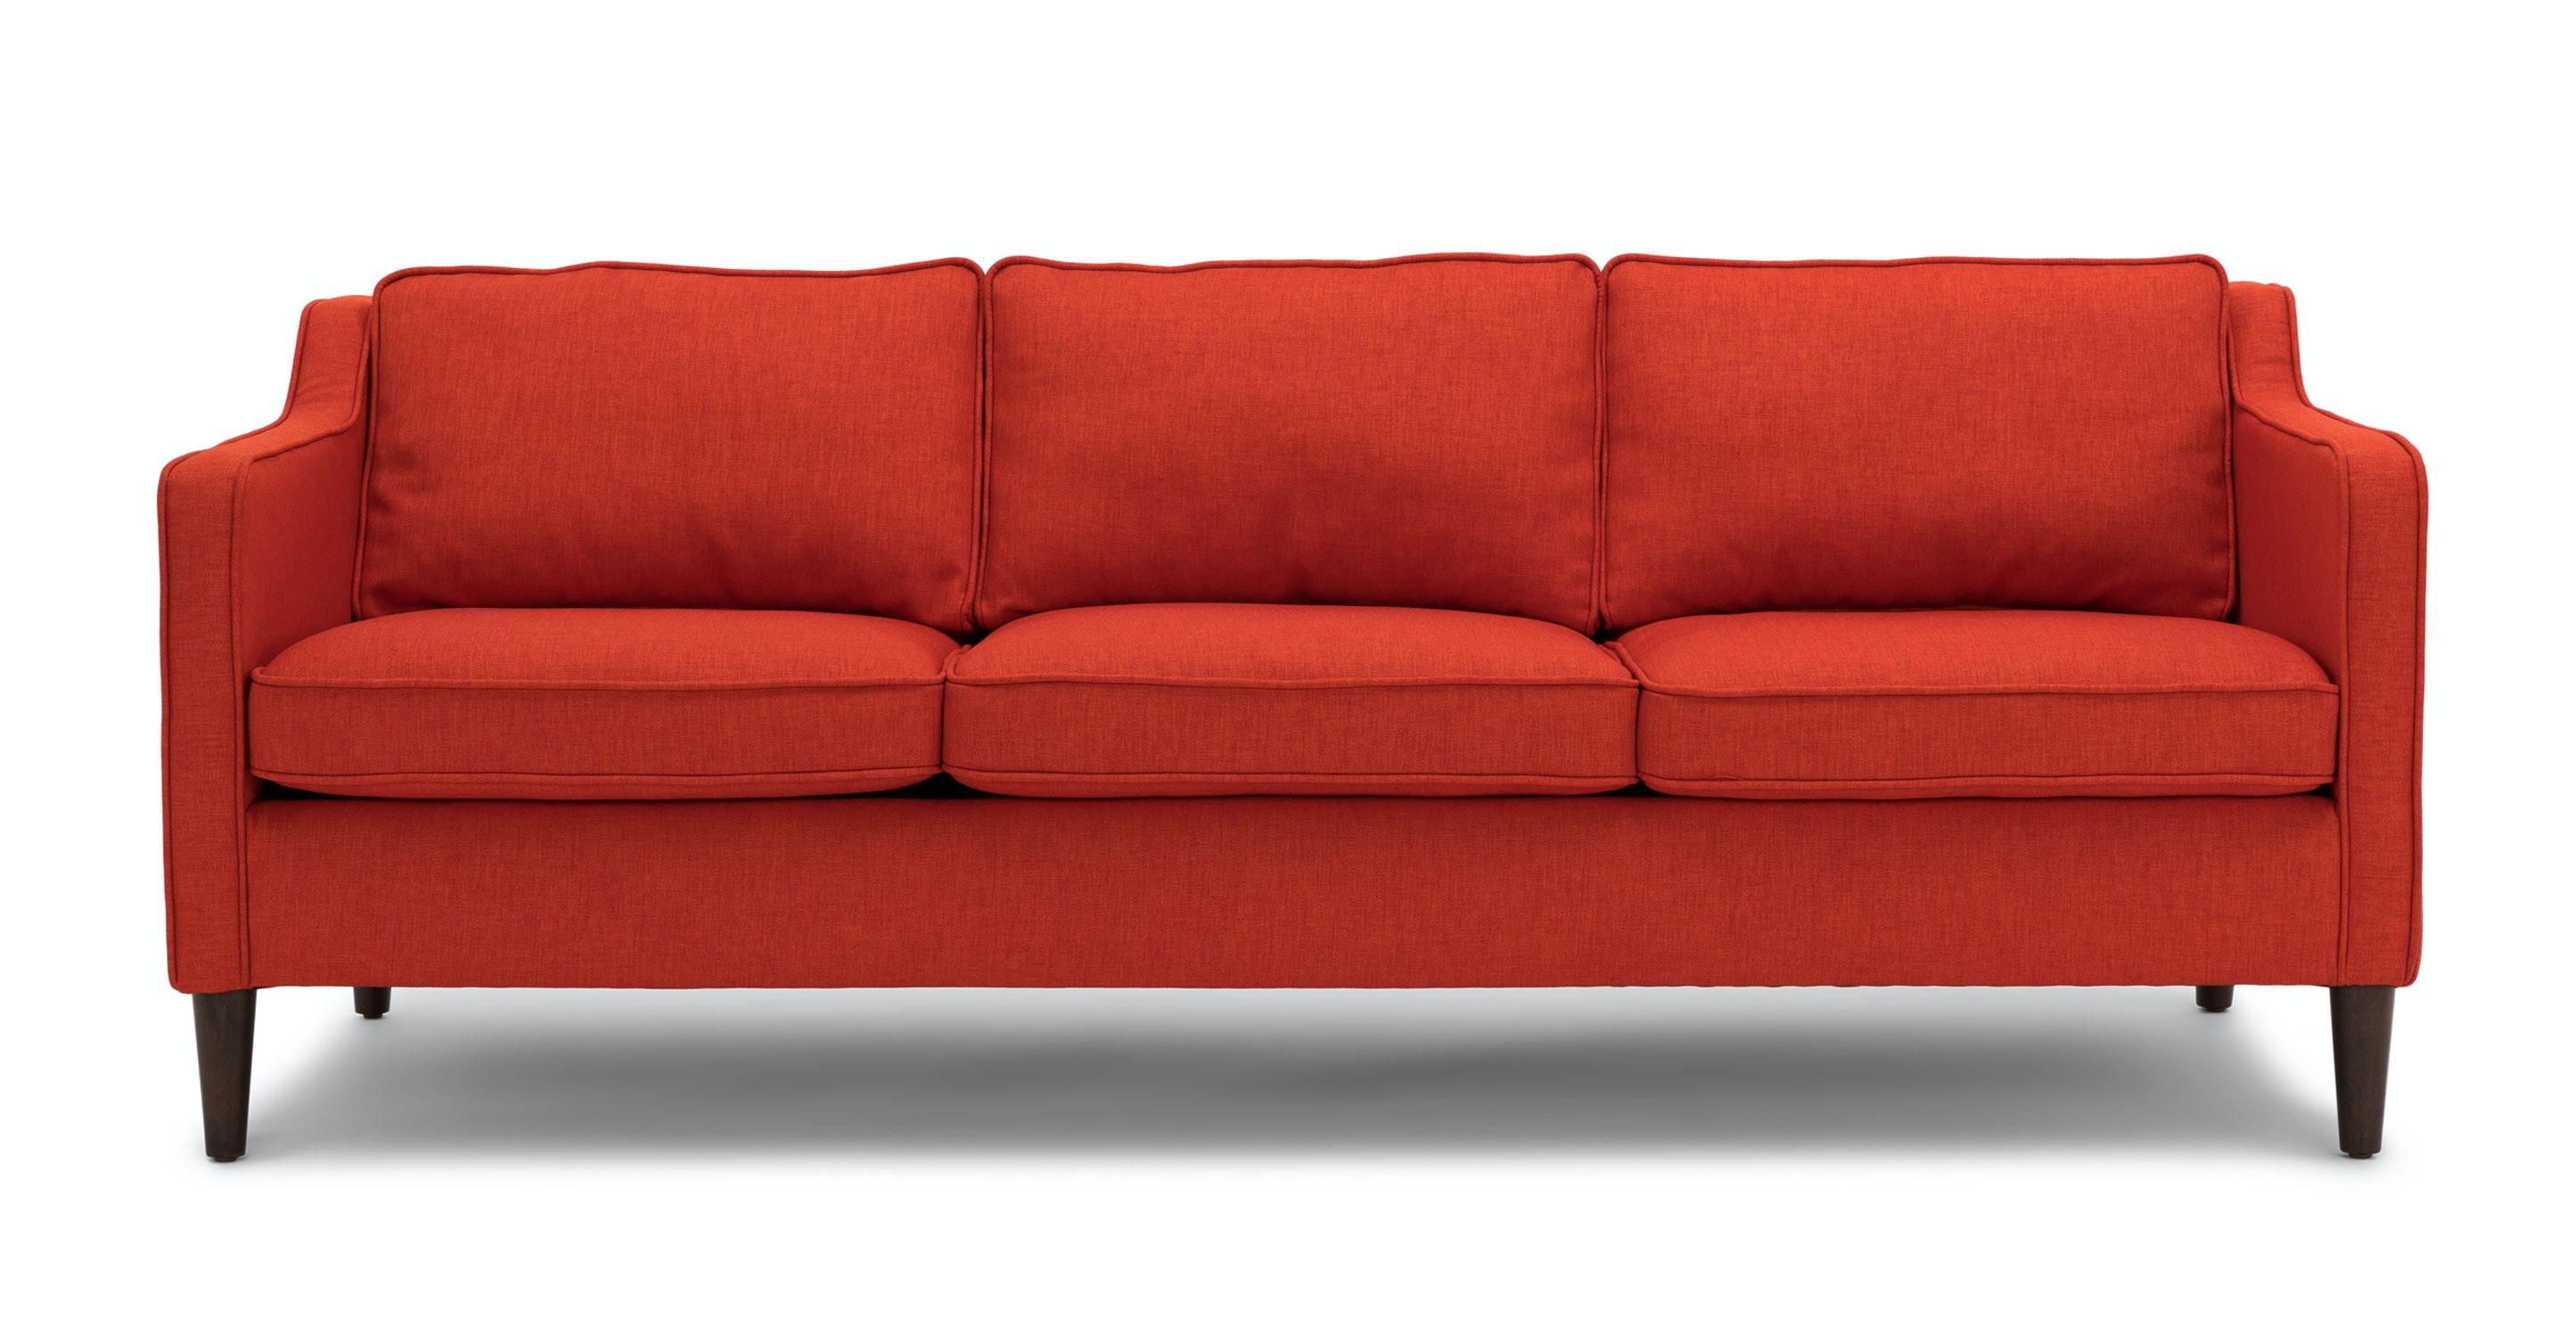 Cherie Fiery Orange Sofa Sofas Article Modern Mid Century And Scandinavian Furniture